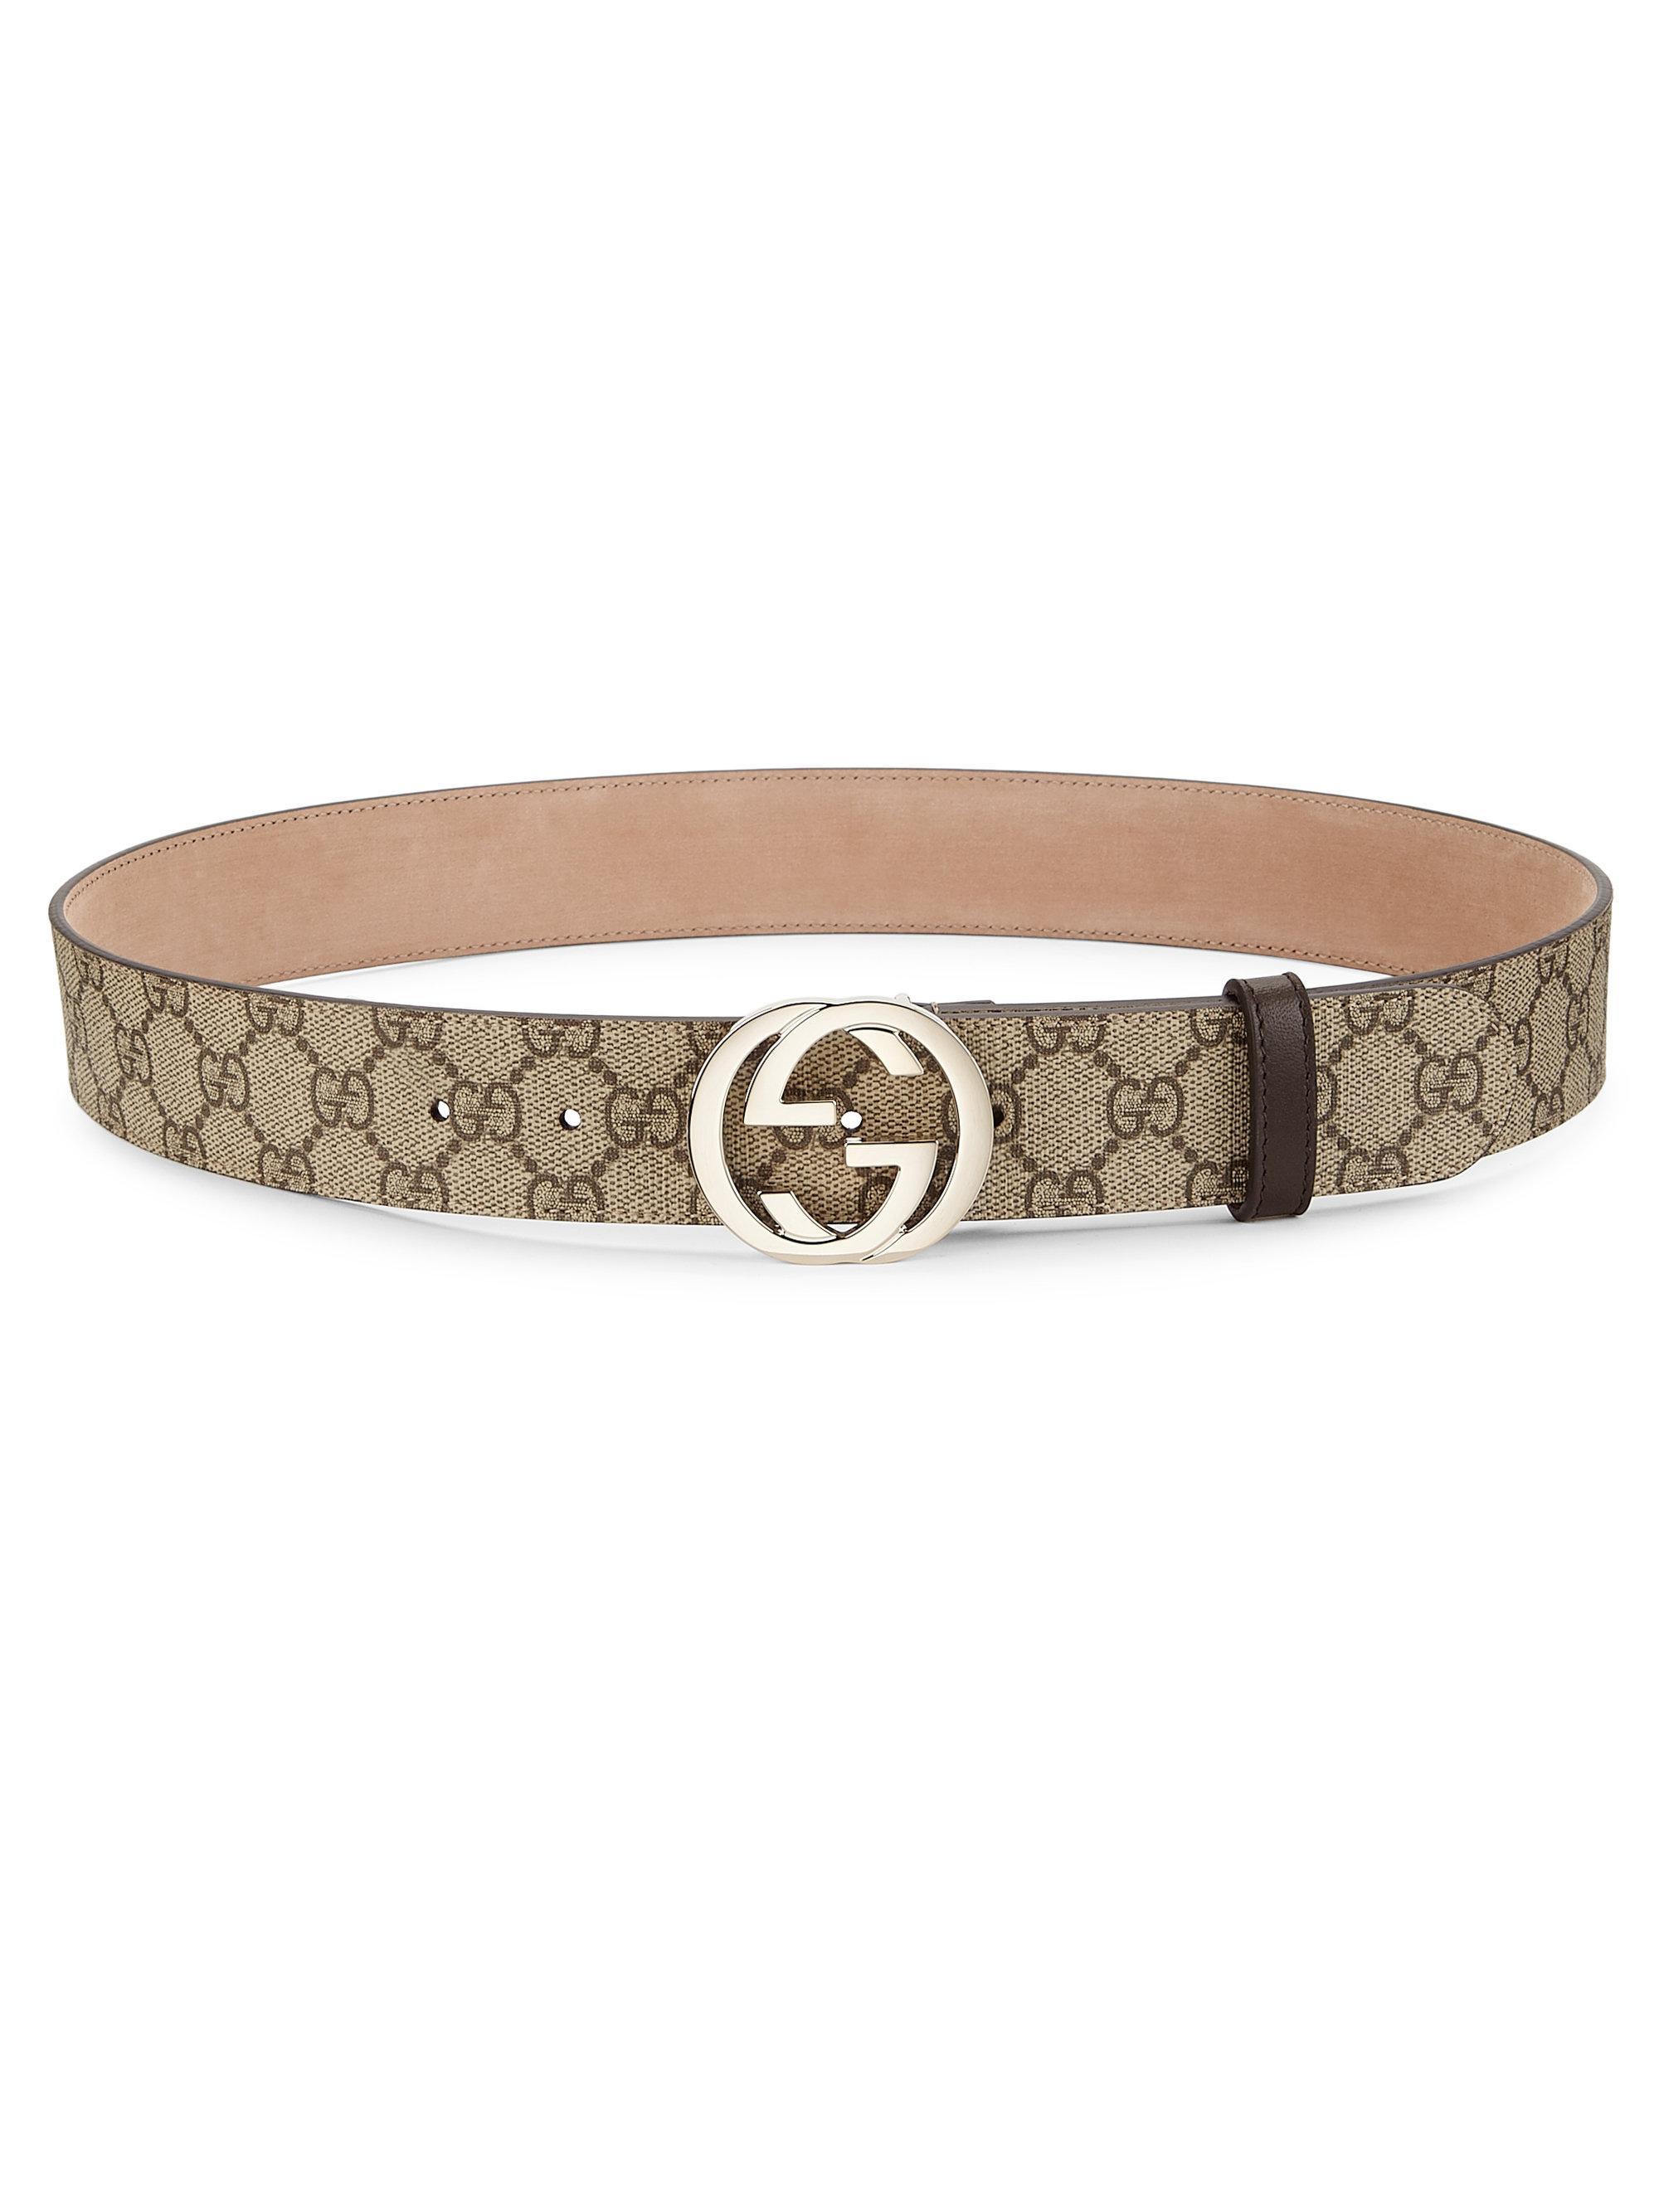 f7c96dcf5277 Gucci Interlocking G Logo Belt in Natural - Lyst